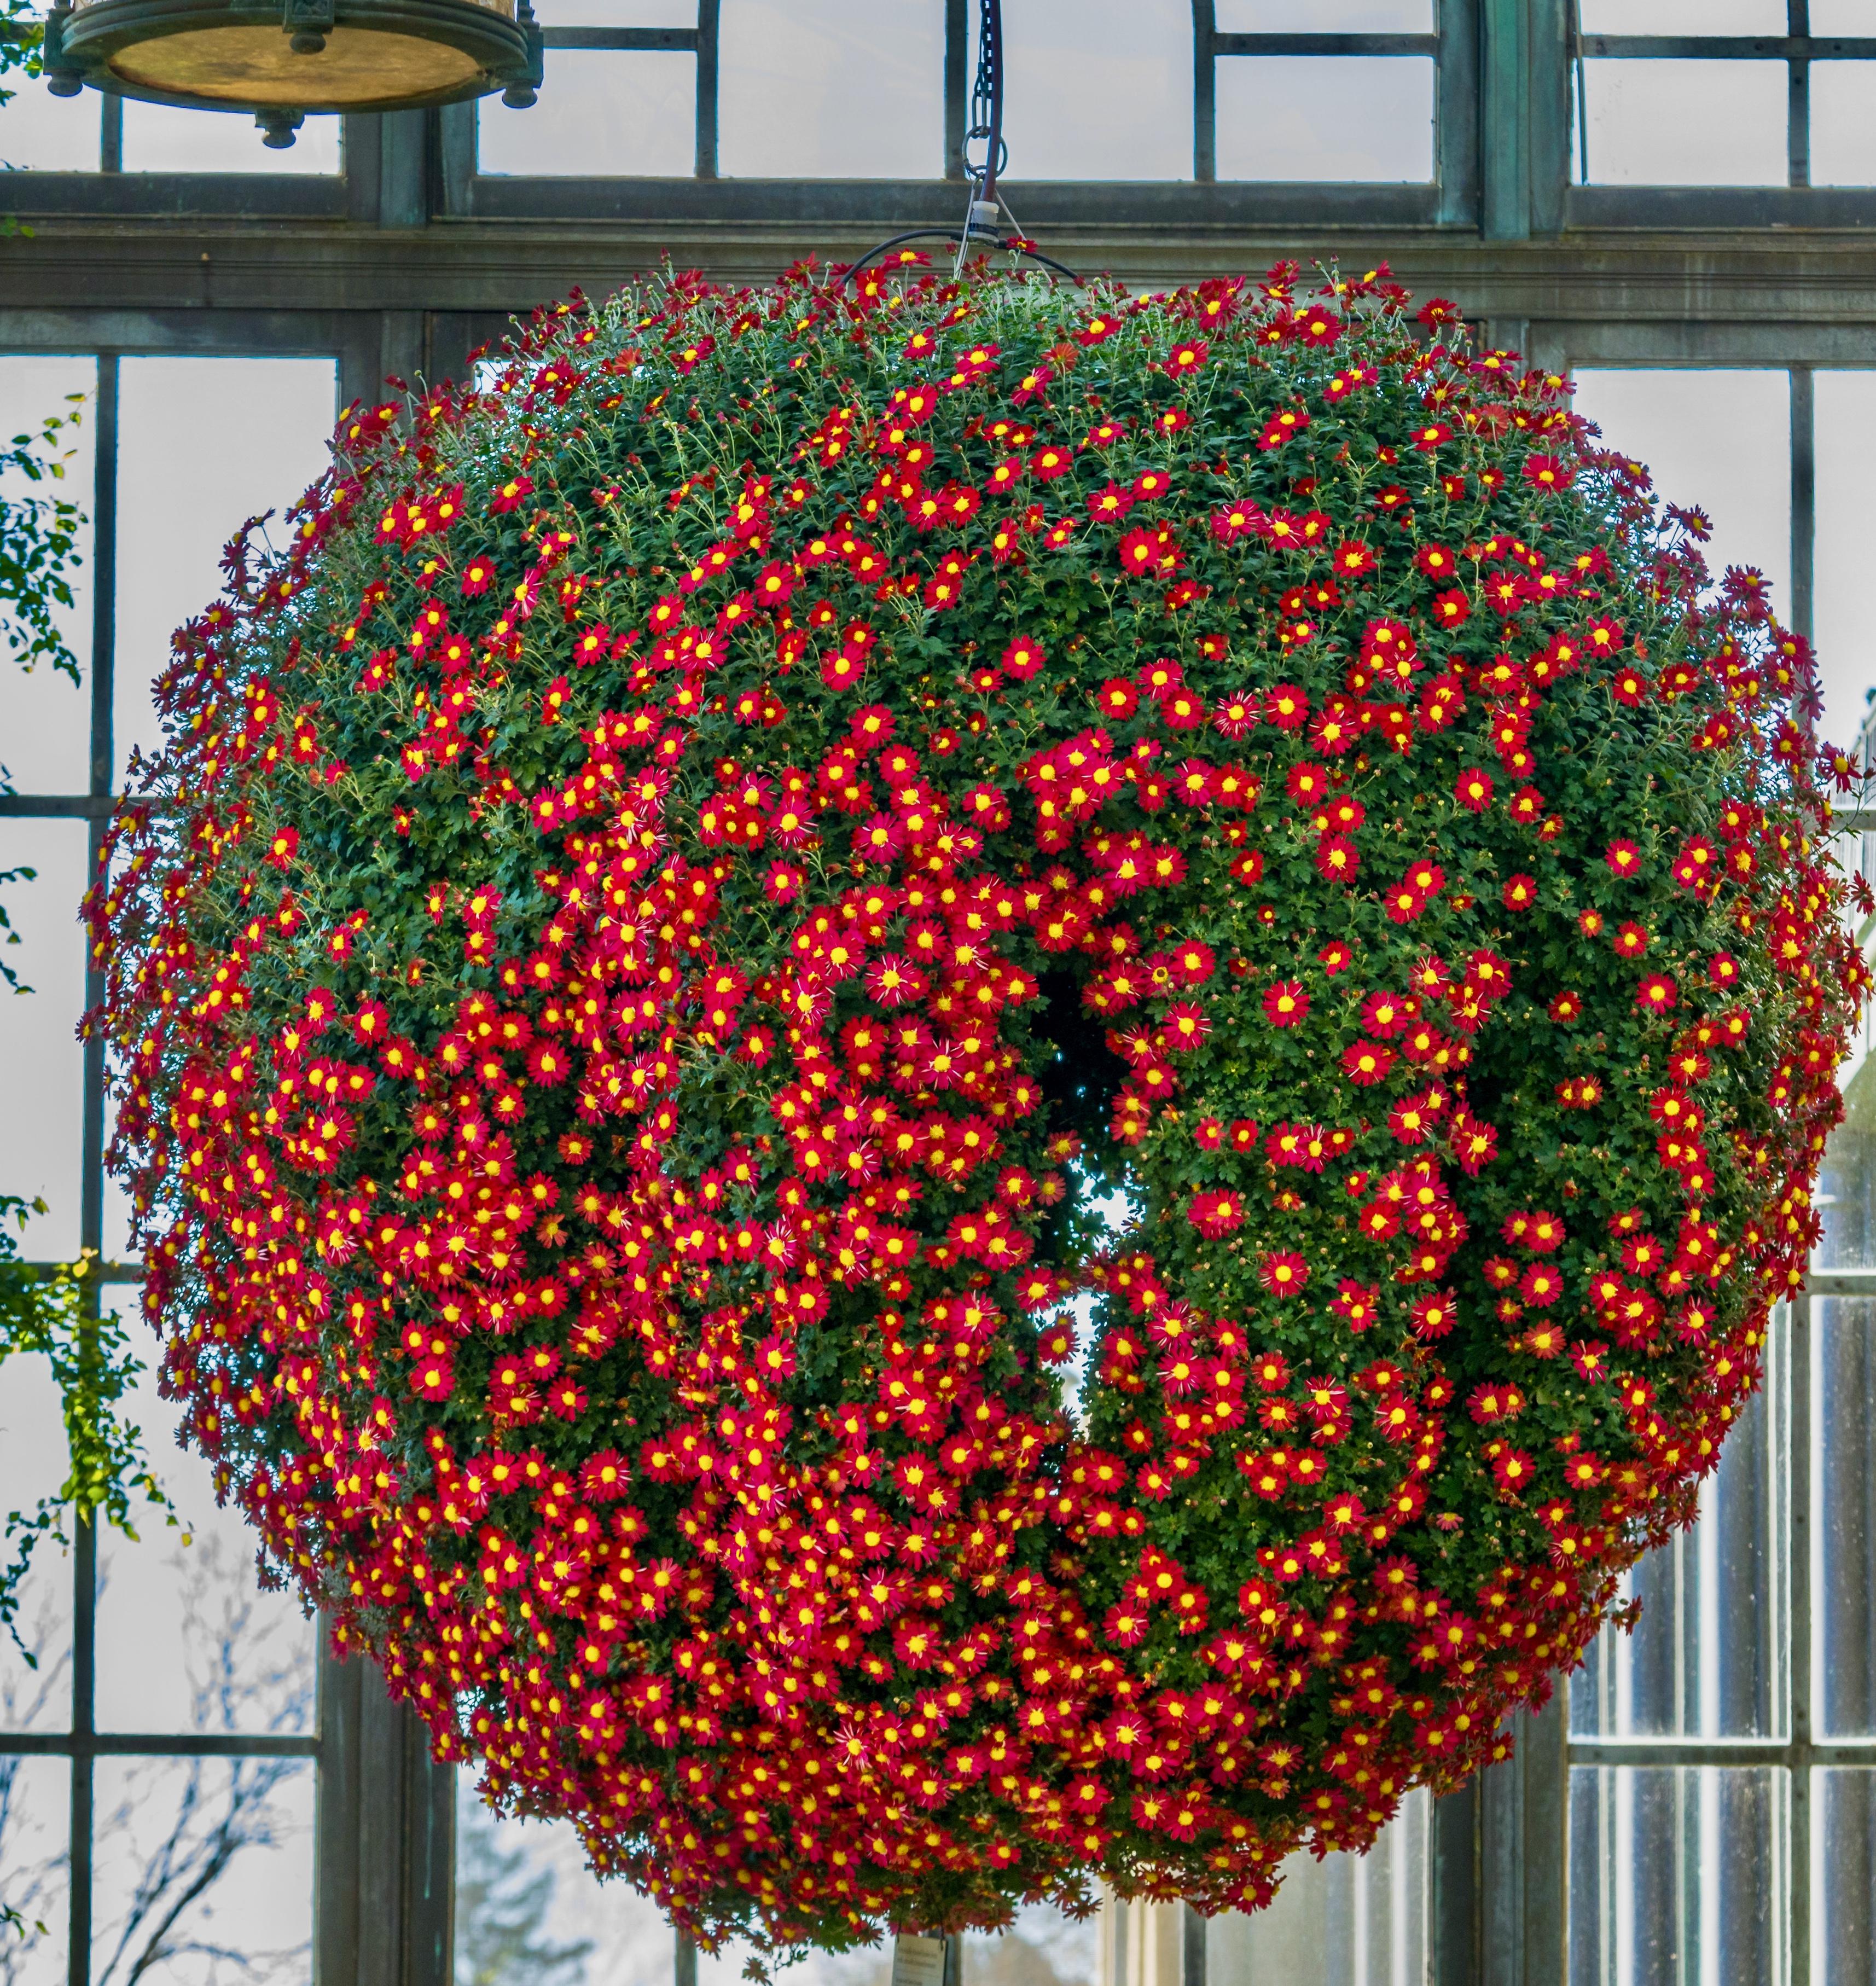 Chandelier of Chrysanthemums